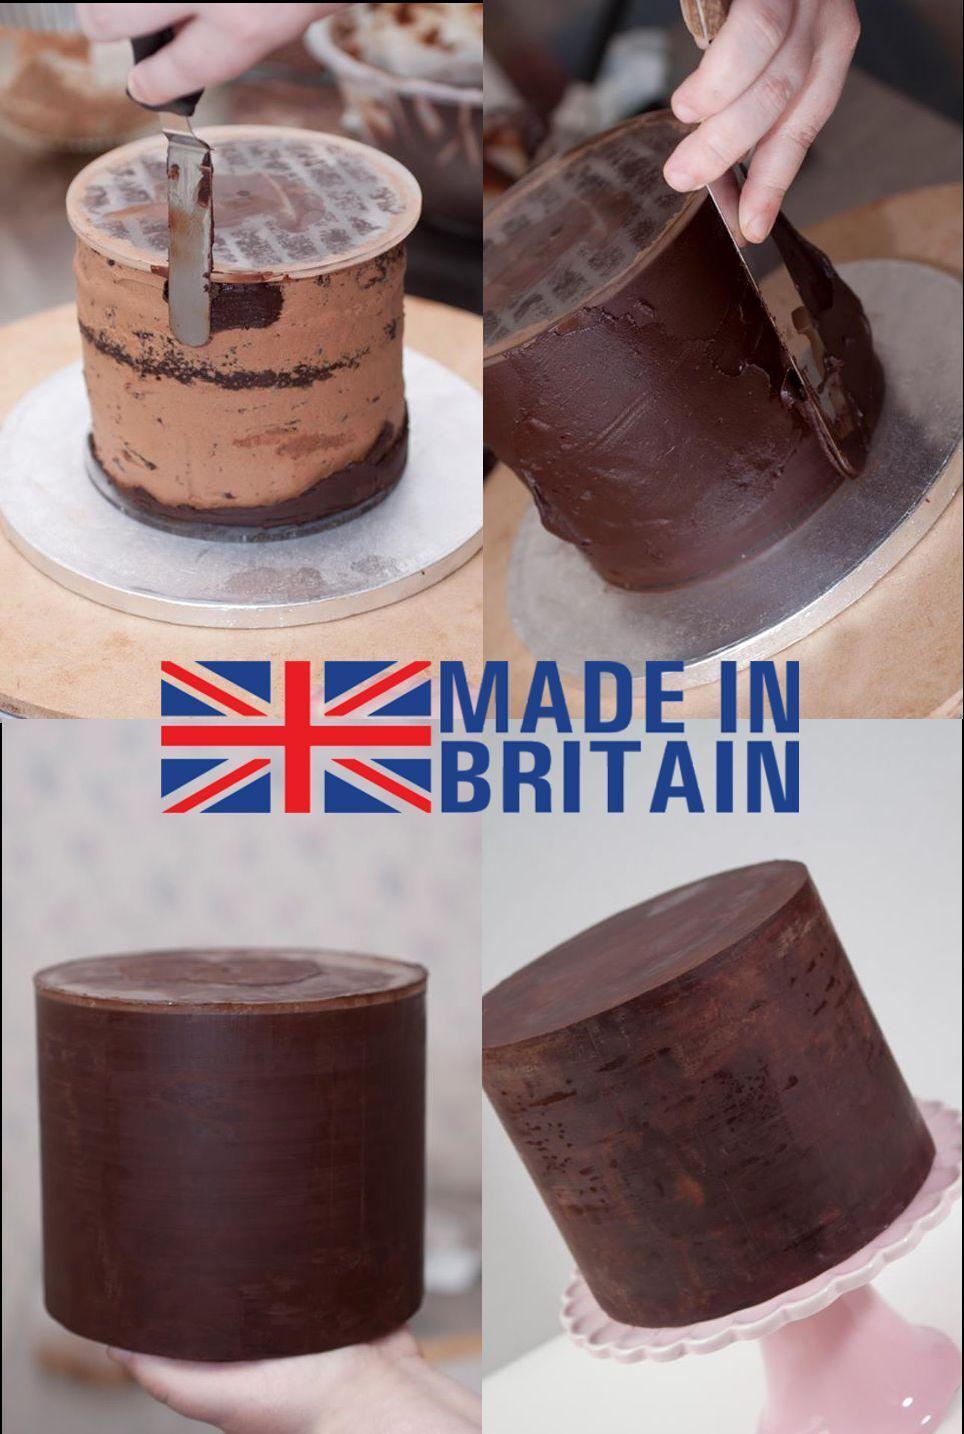 Scraper Ganache Buttercream acrylic smoother disc cake decorating **4 SIZES**